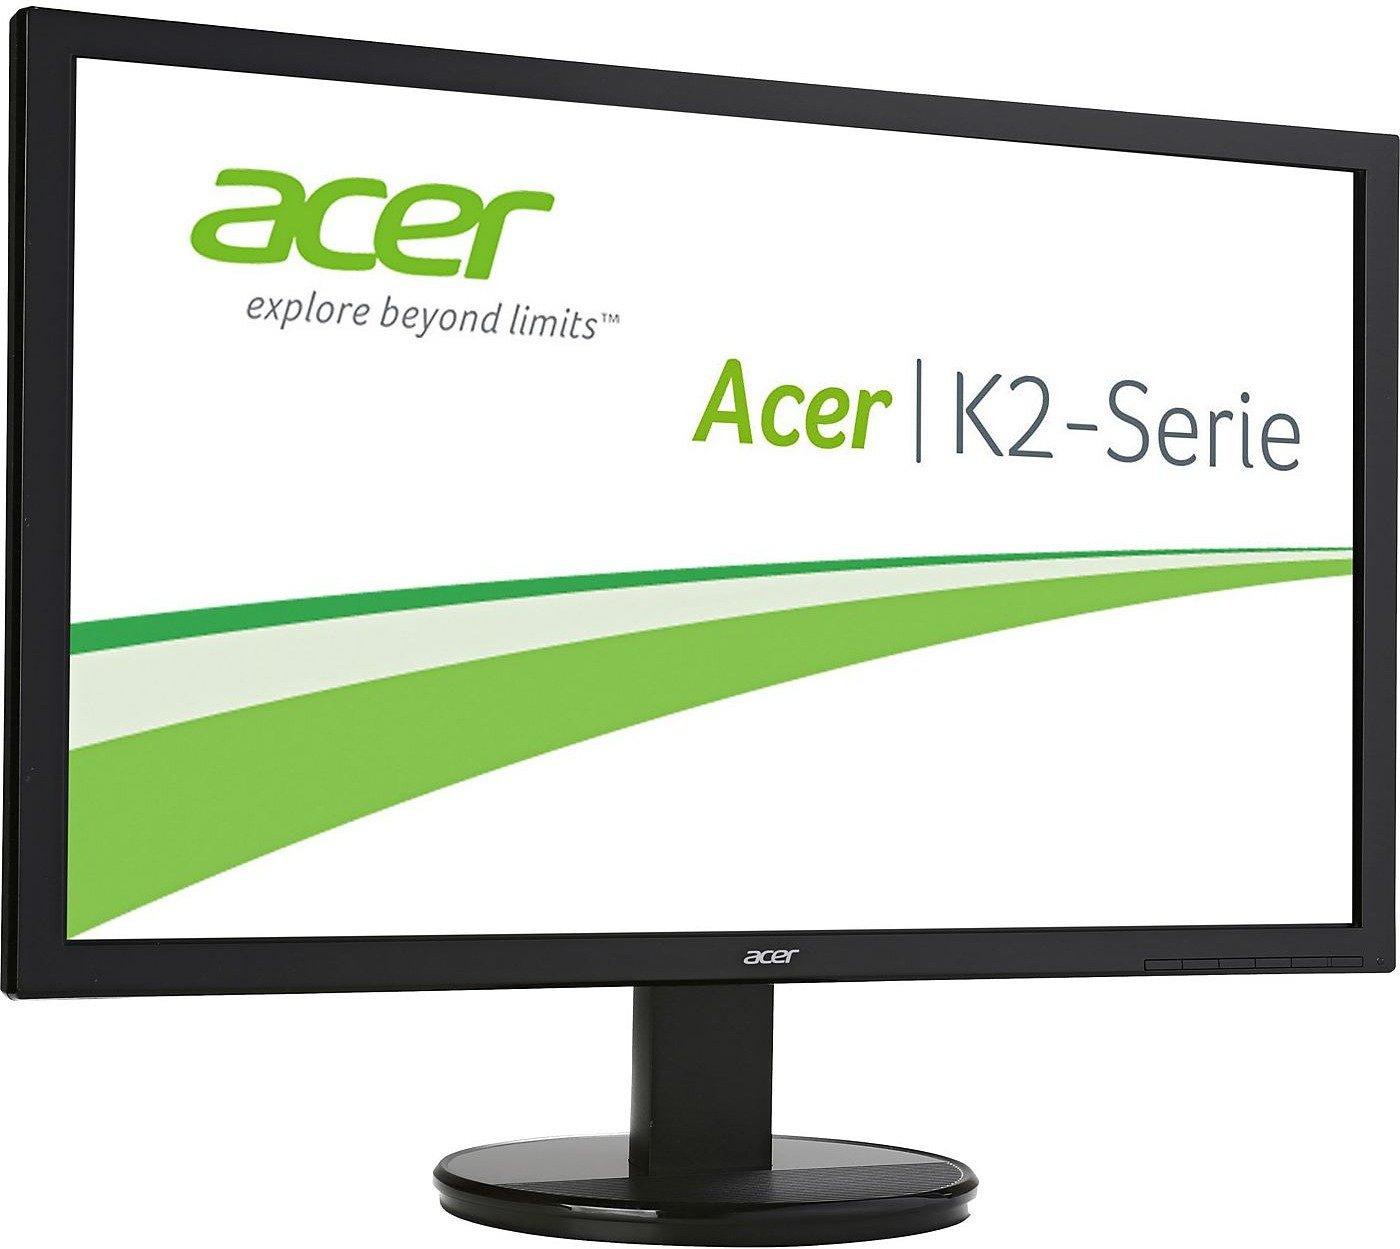 Acer K242HQLBbid Monitor 23,6'' FHD TN, 300cd/m², 100.000.000:1, 5ms, HDMI + DVI, VESA (Notebooksbilliger)